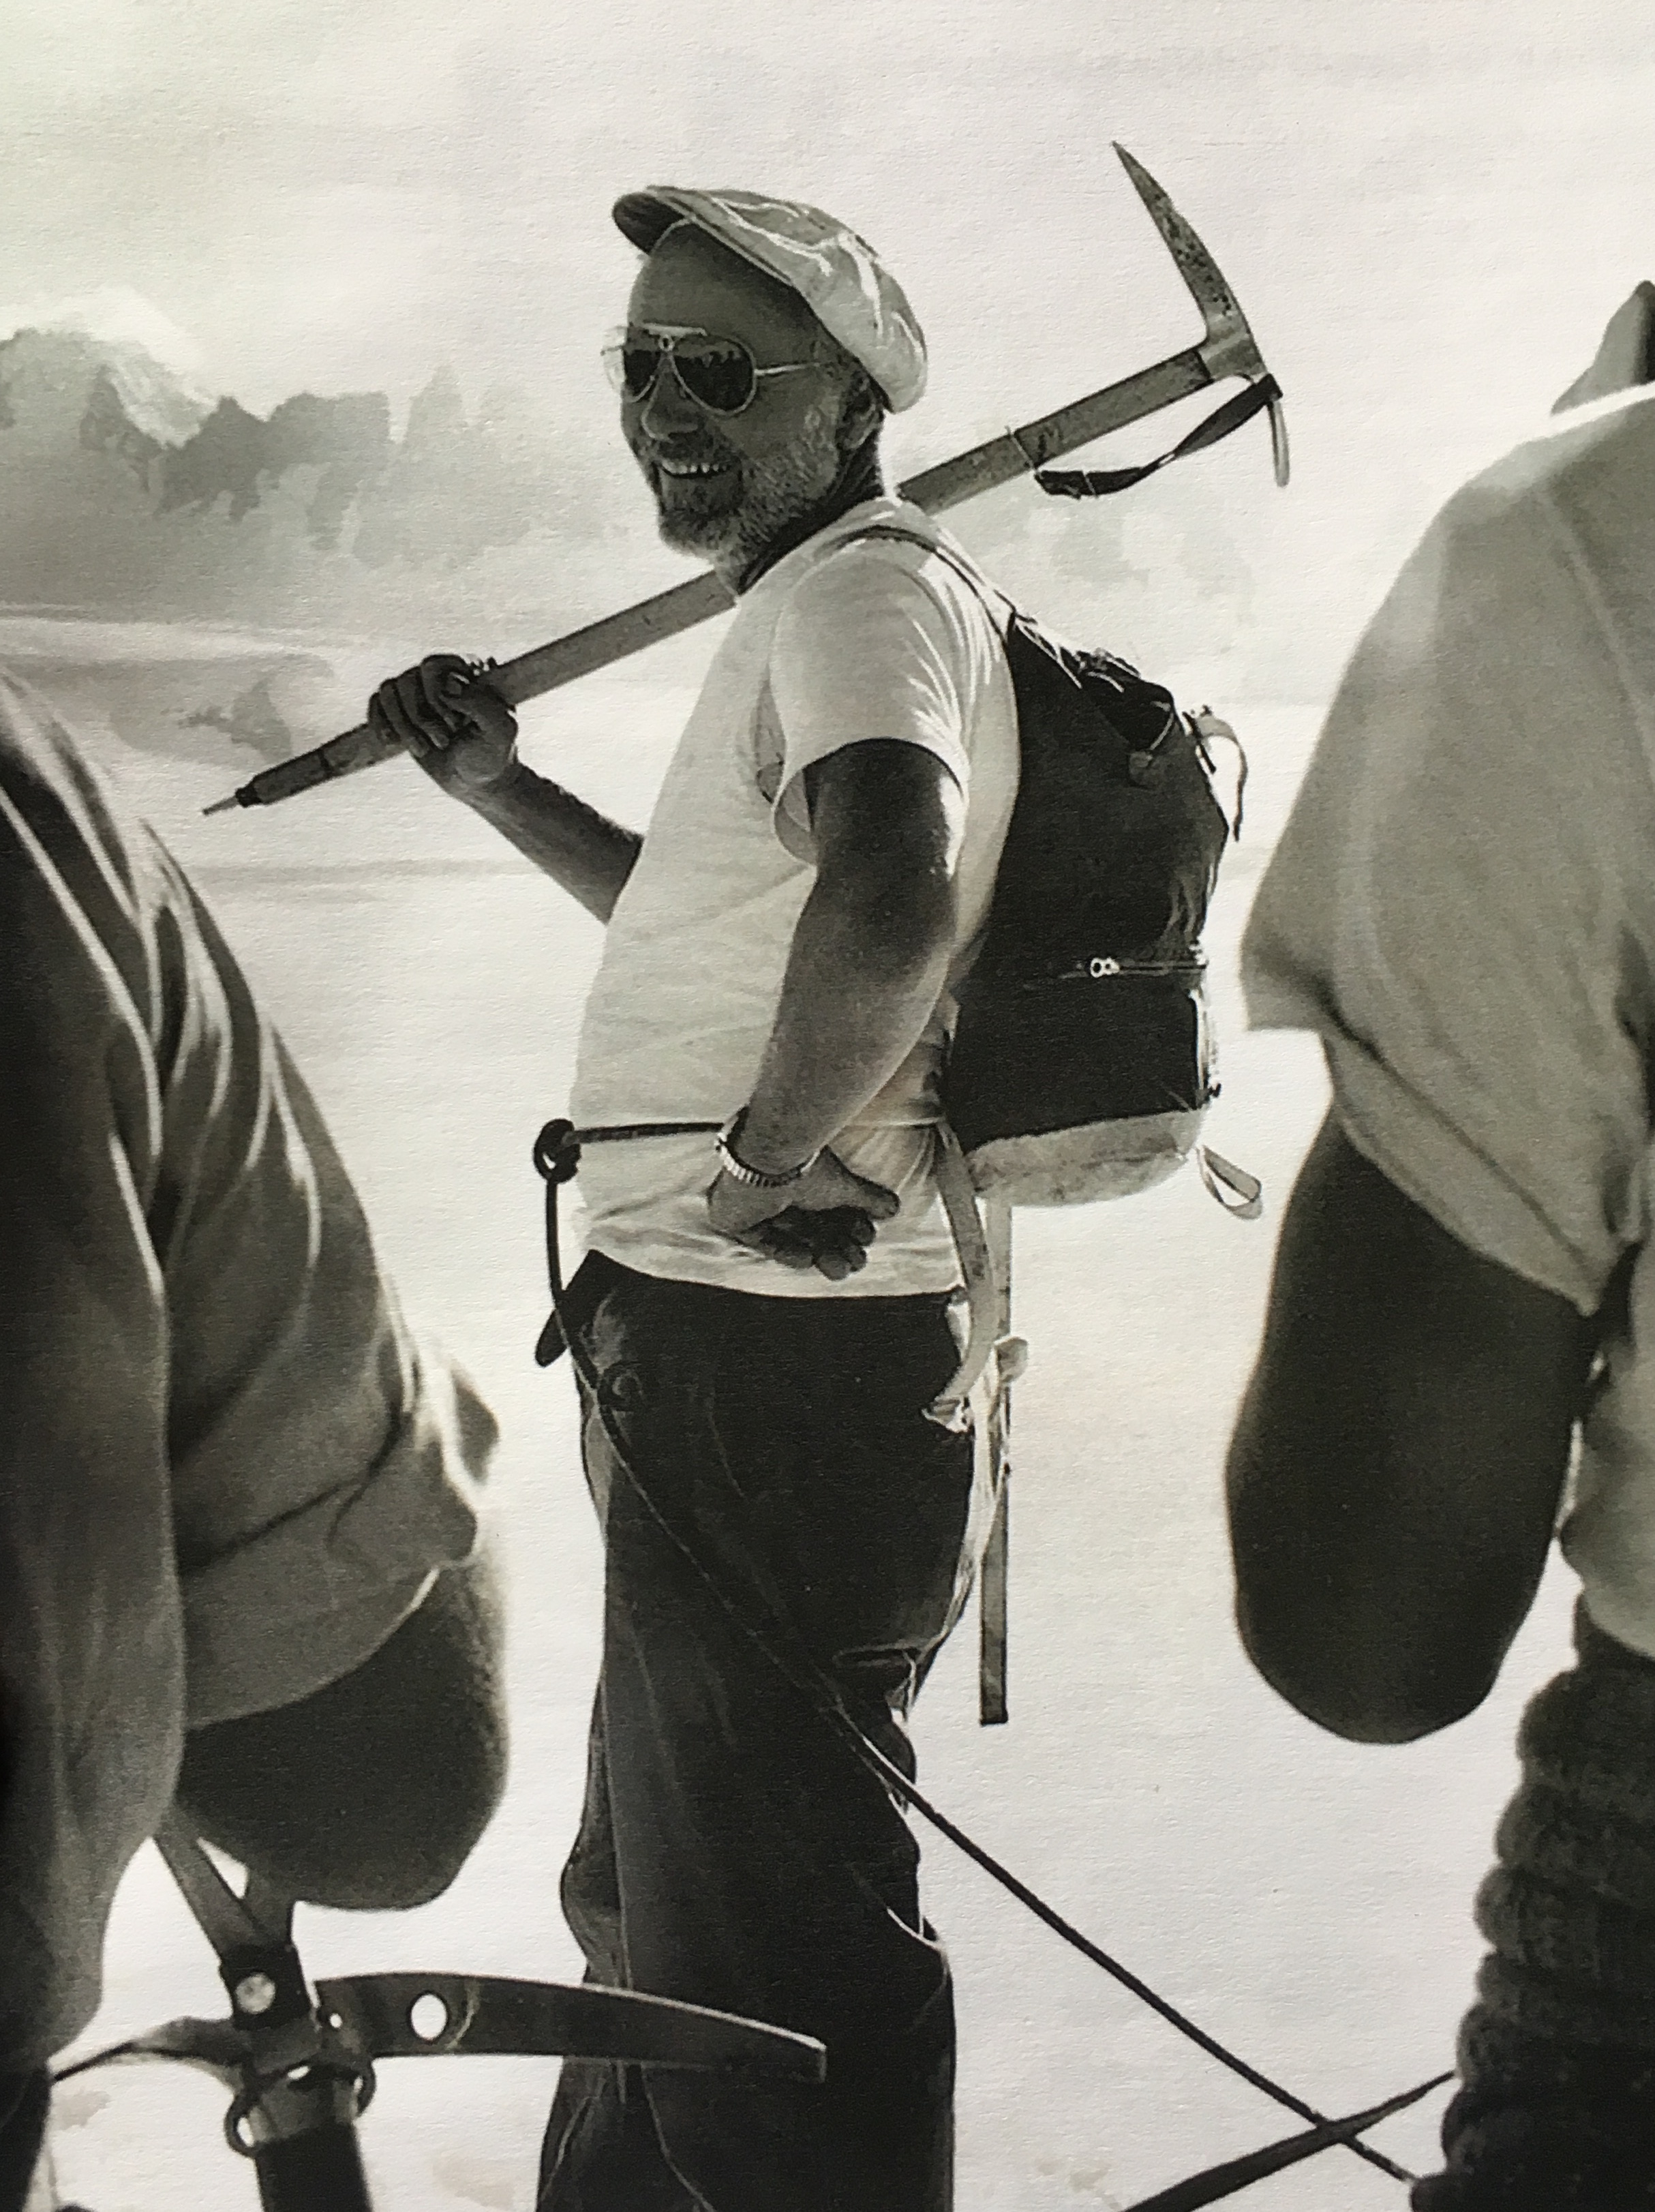 Maynard Miller, Taku Glacier, [year unknown]